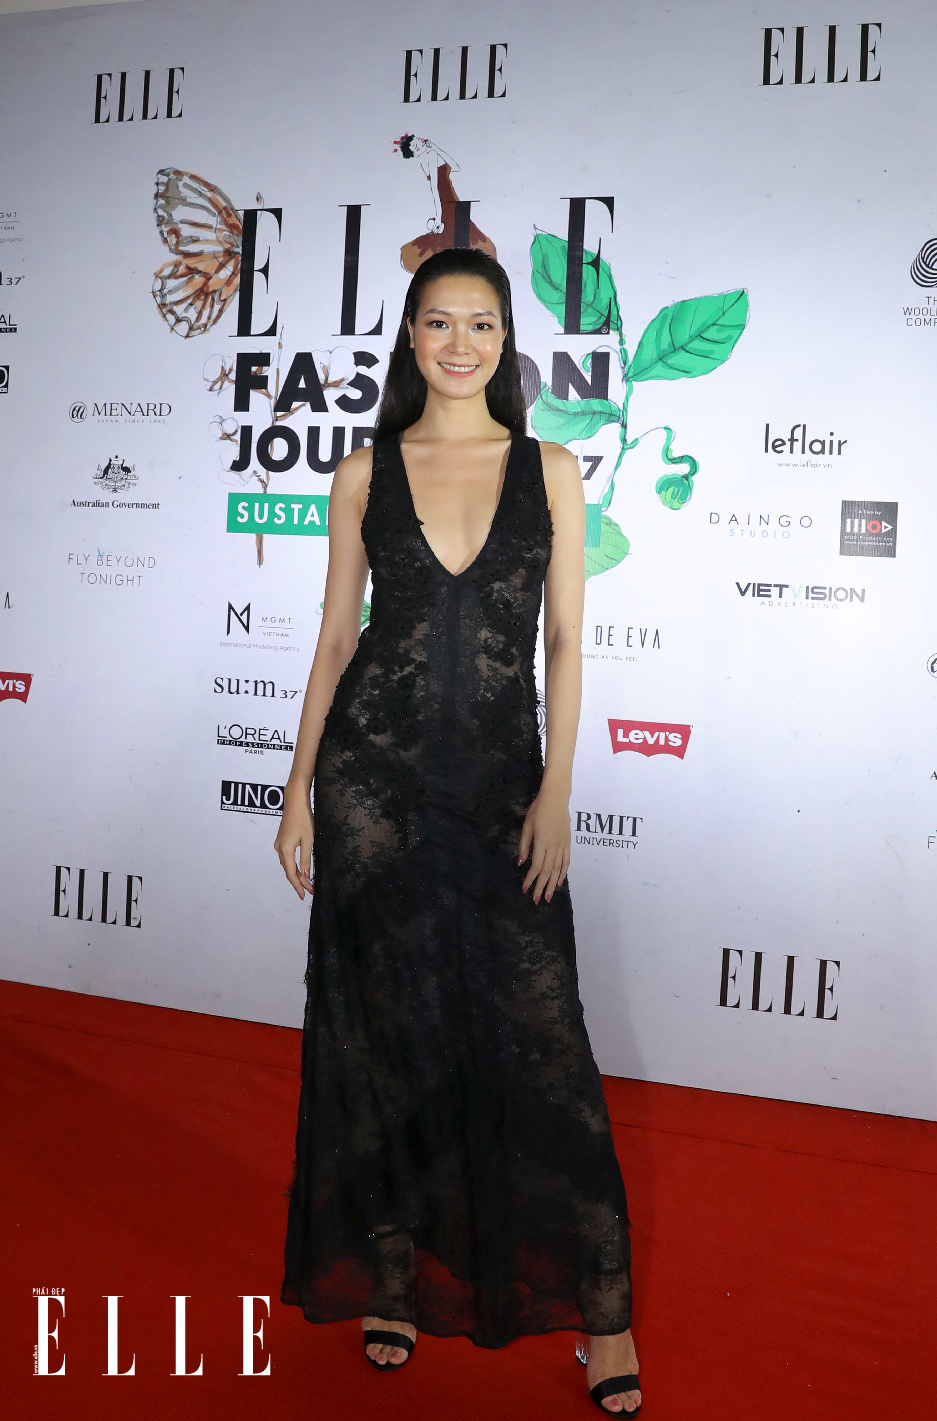 elle fashion journey 2017 34